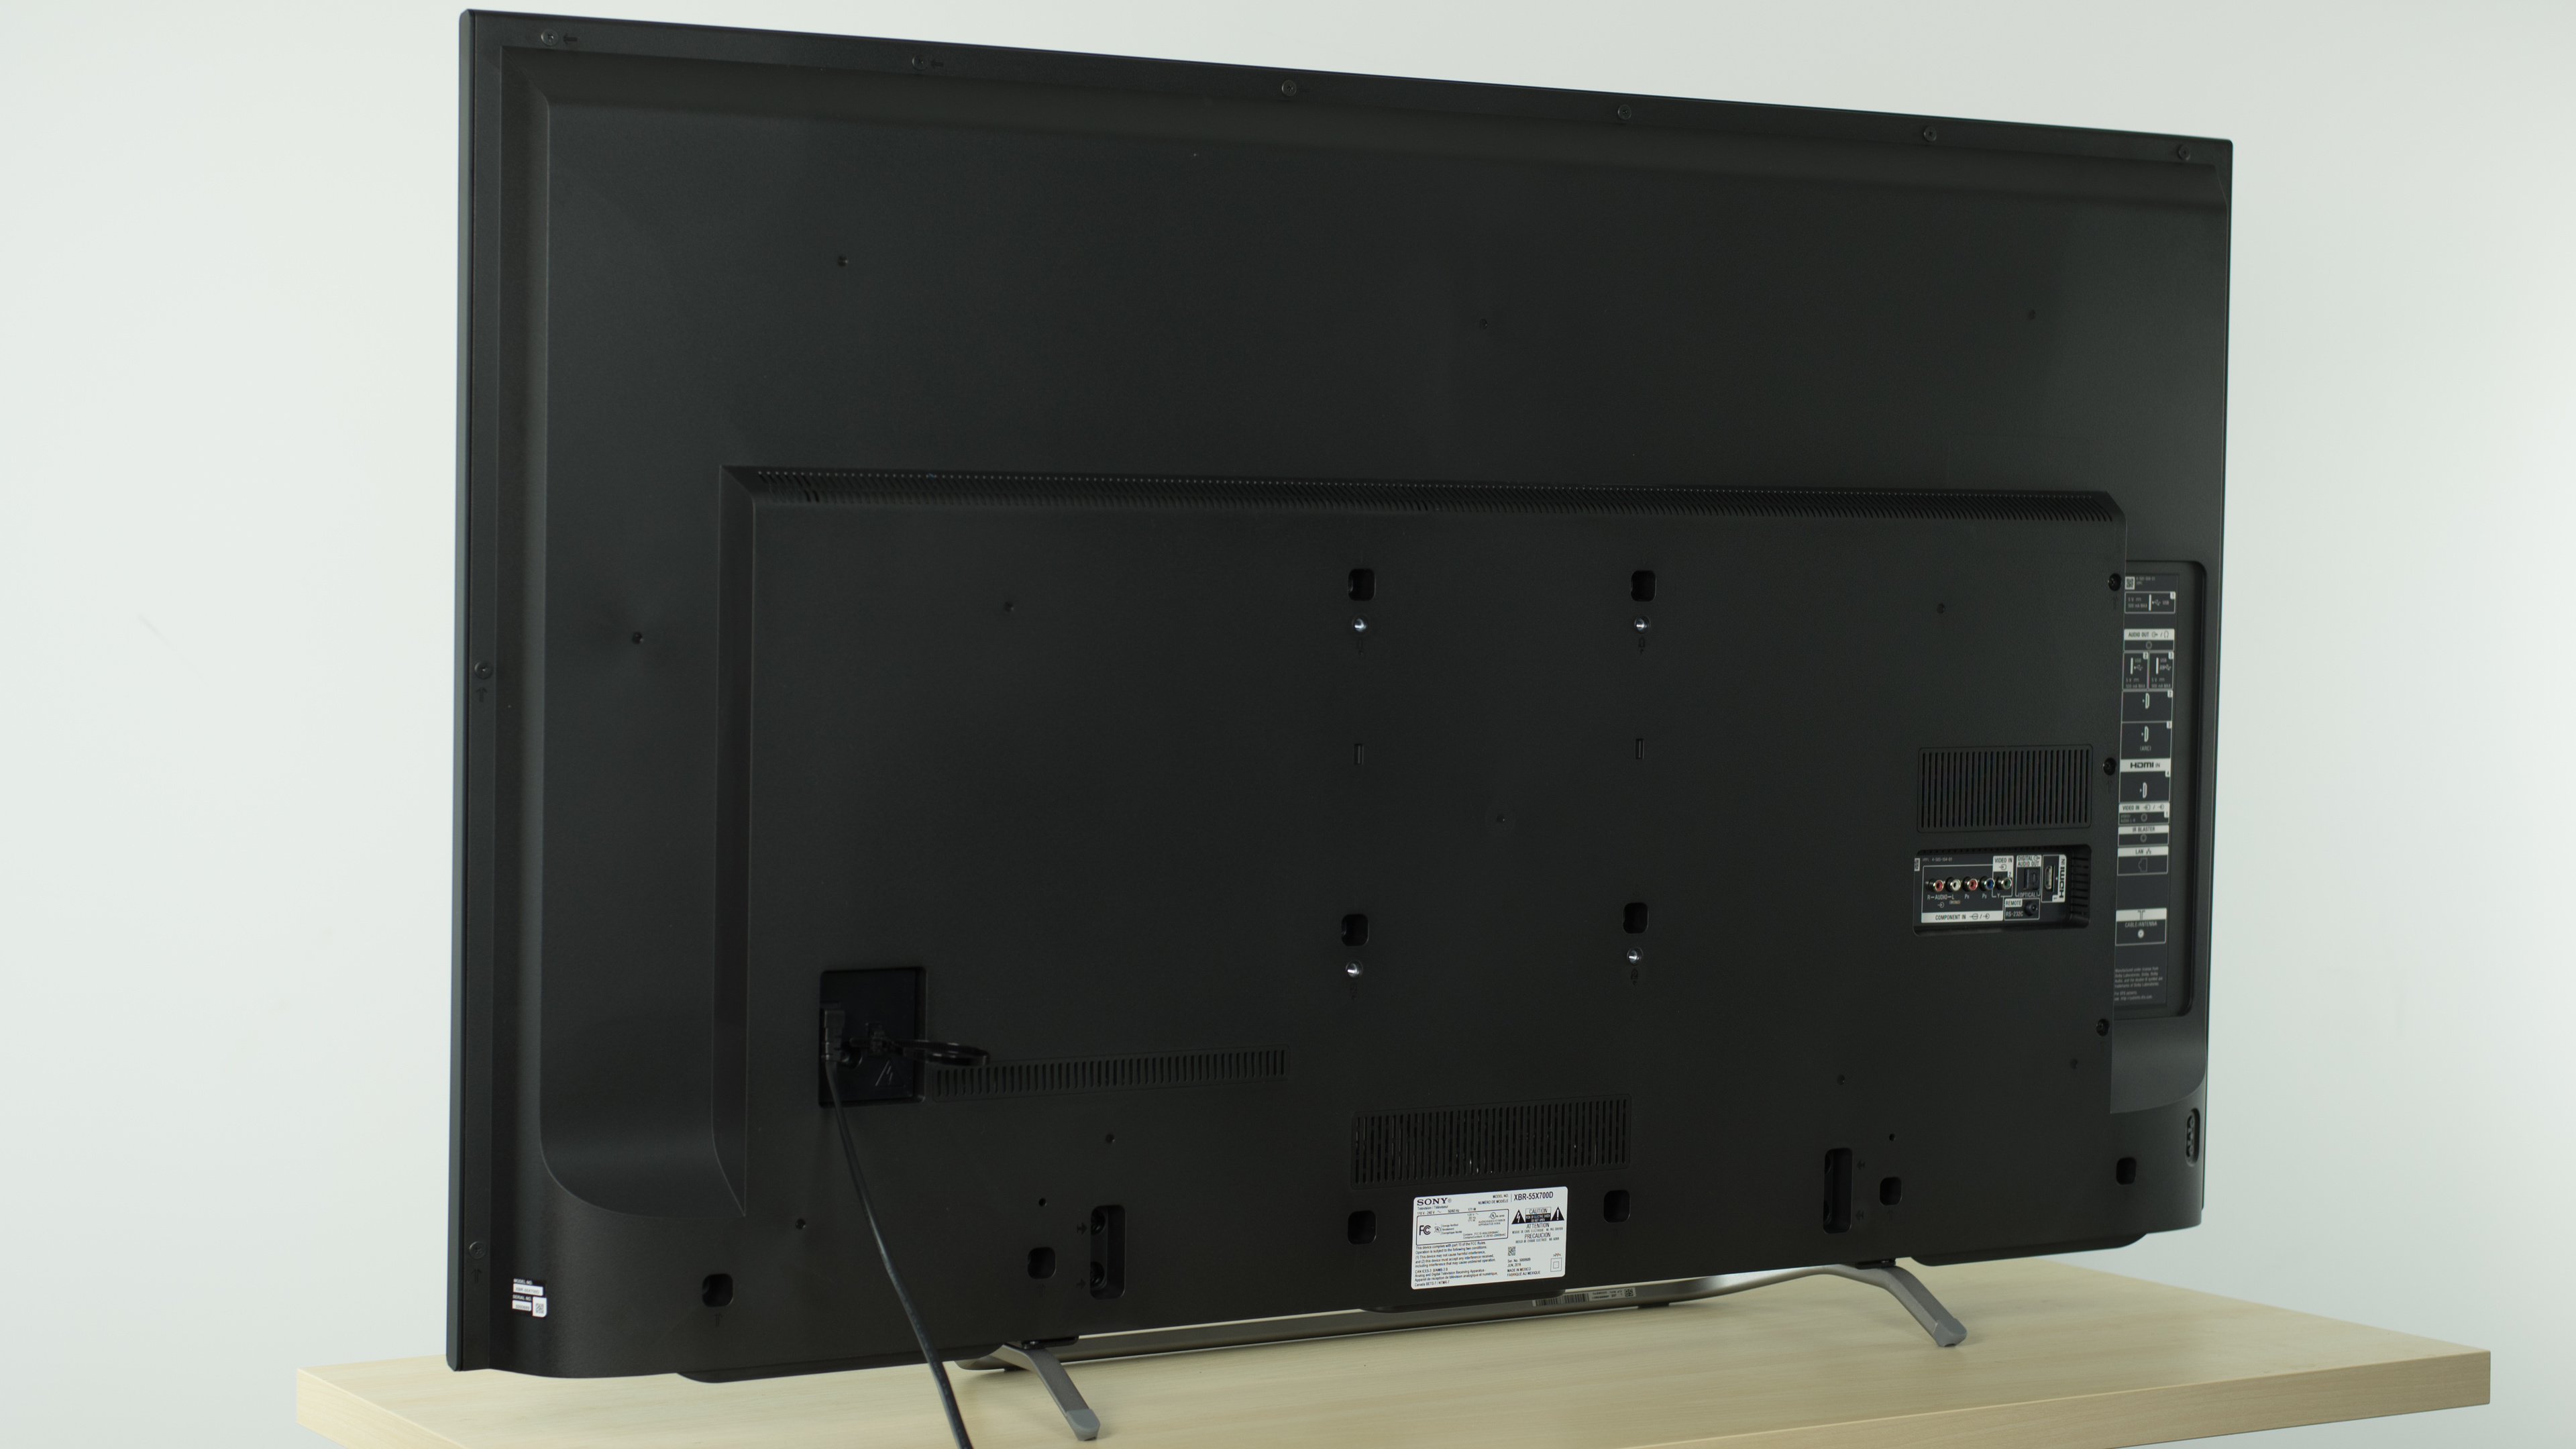 Sony X700d Review Xbr49x700d Xbr55x700d Rtings Com